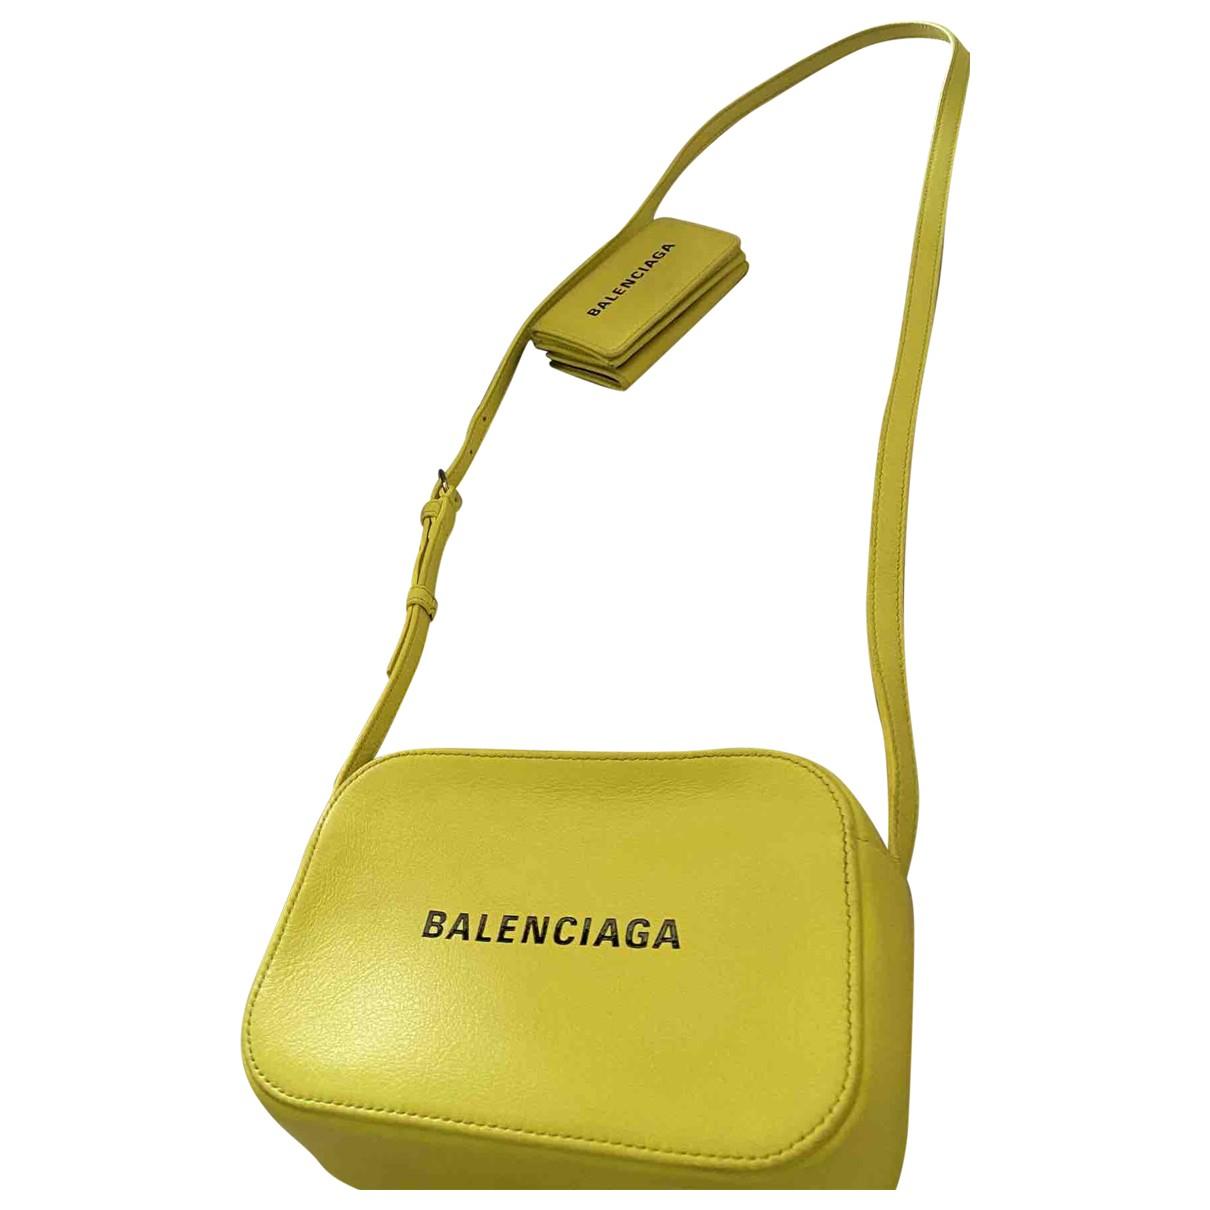 Balenciaga - Pochette Camera pour femme en cuir - jaune